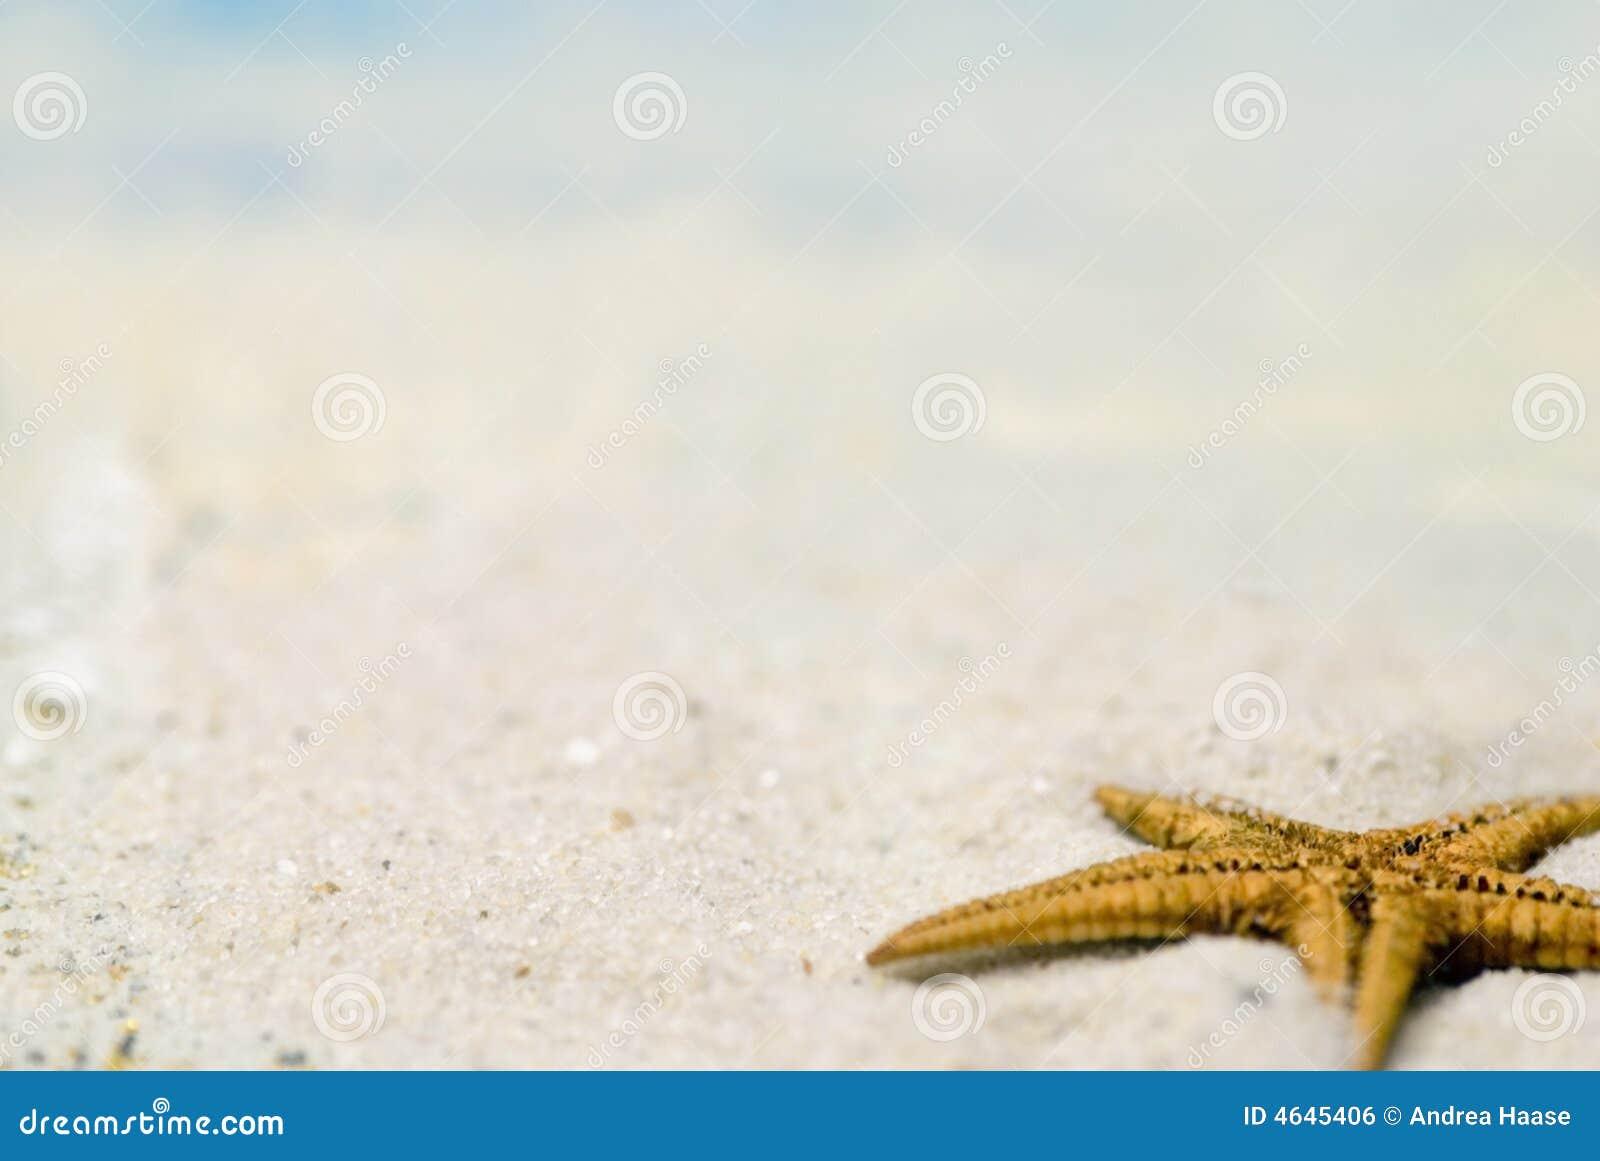 Starfish na praia arenosa